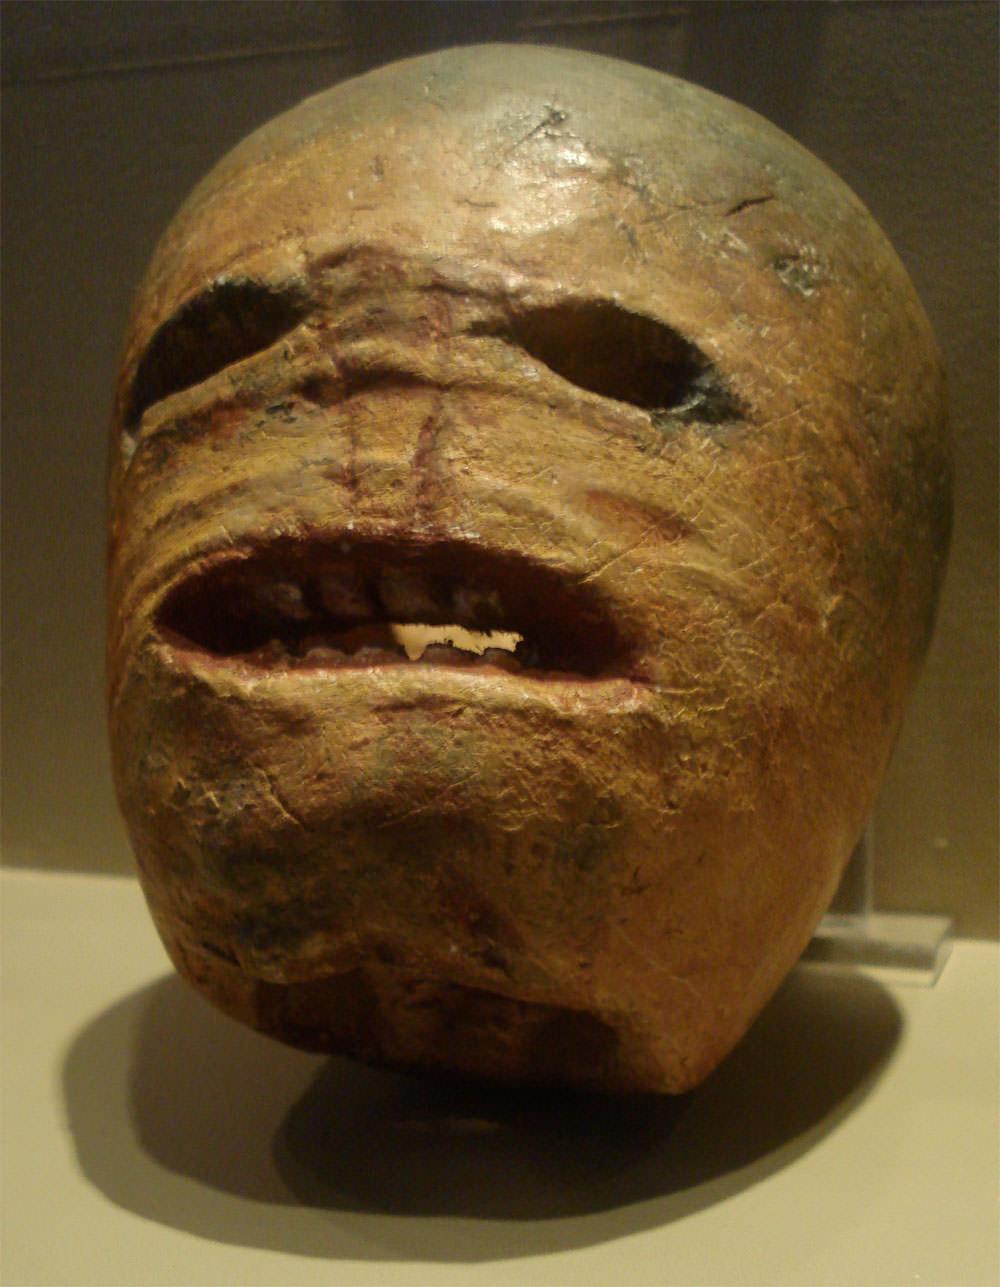 https://i2.wp.com/www.medievalists.net/wp-content/uploads/2012/05/celtic-halloween.jpg